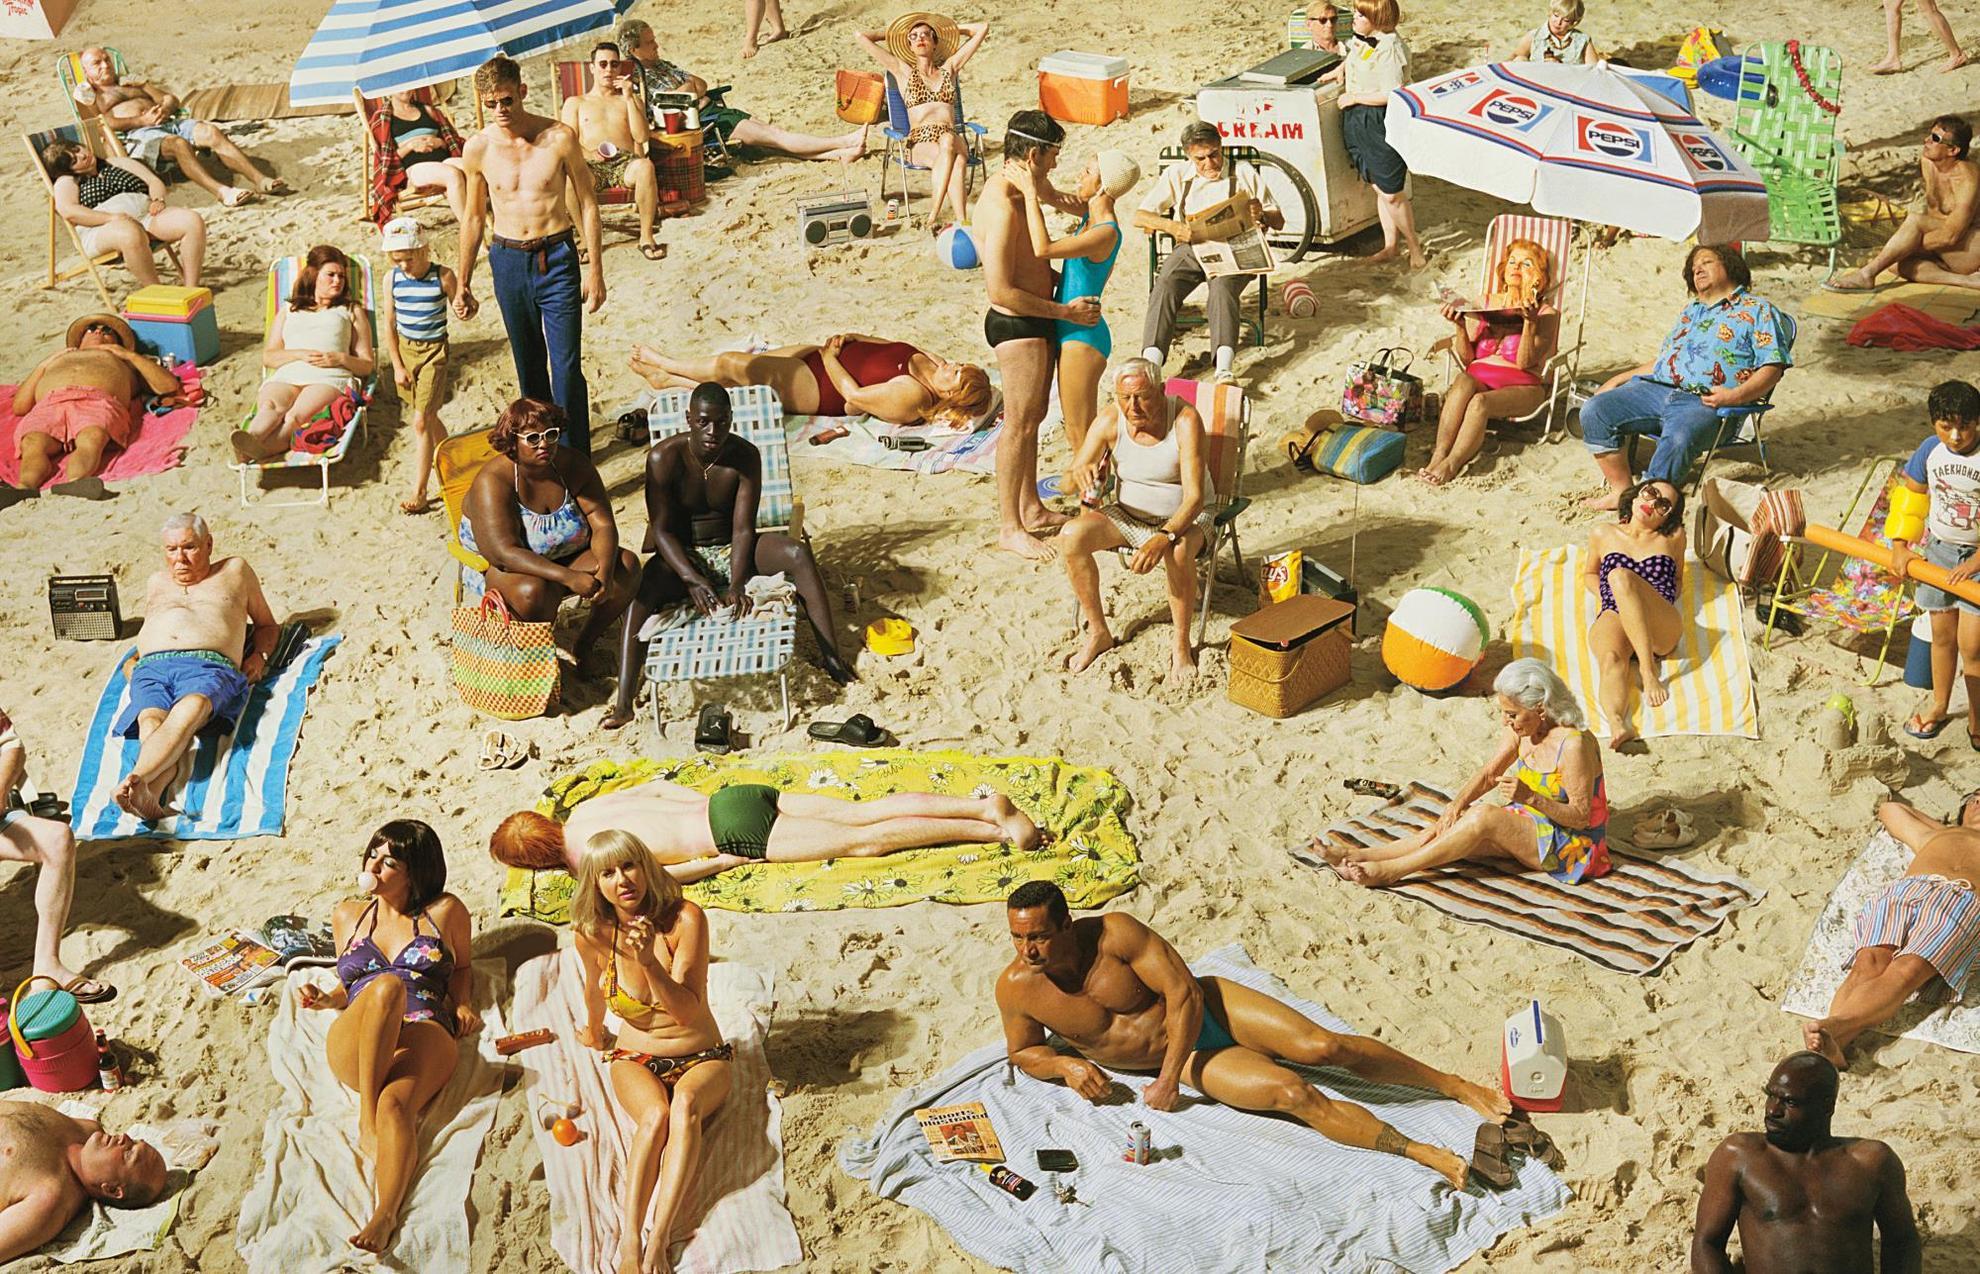 Alex Prager-Crowd #3 (Pelican Beach)-2013